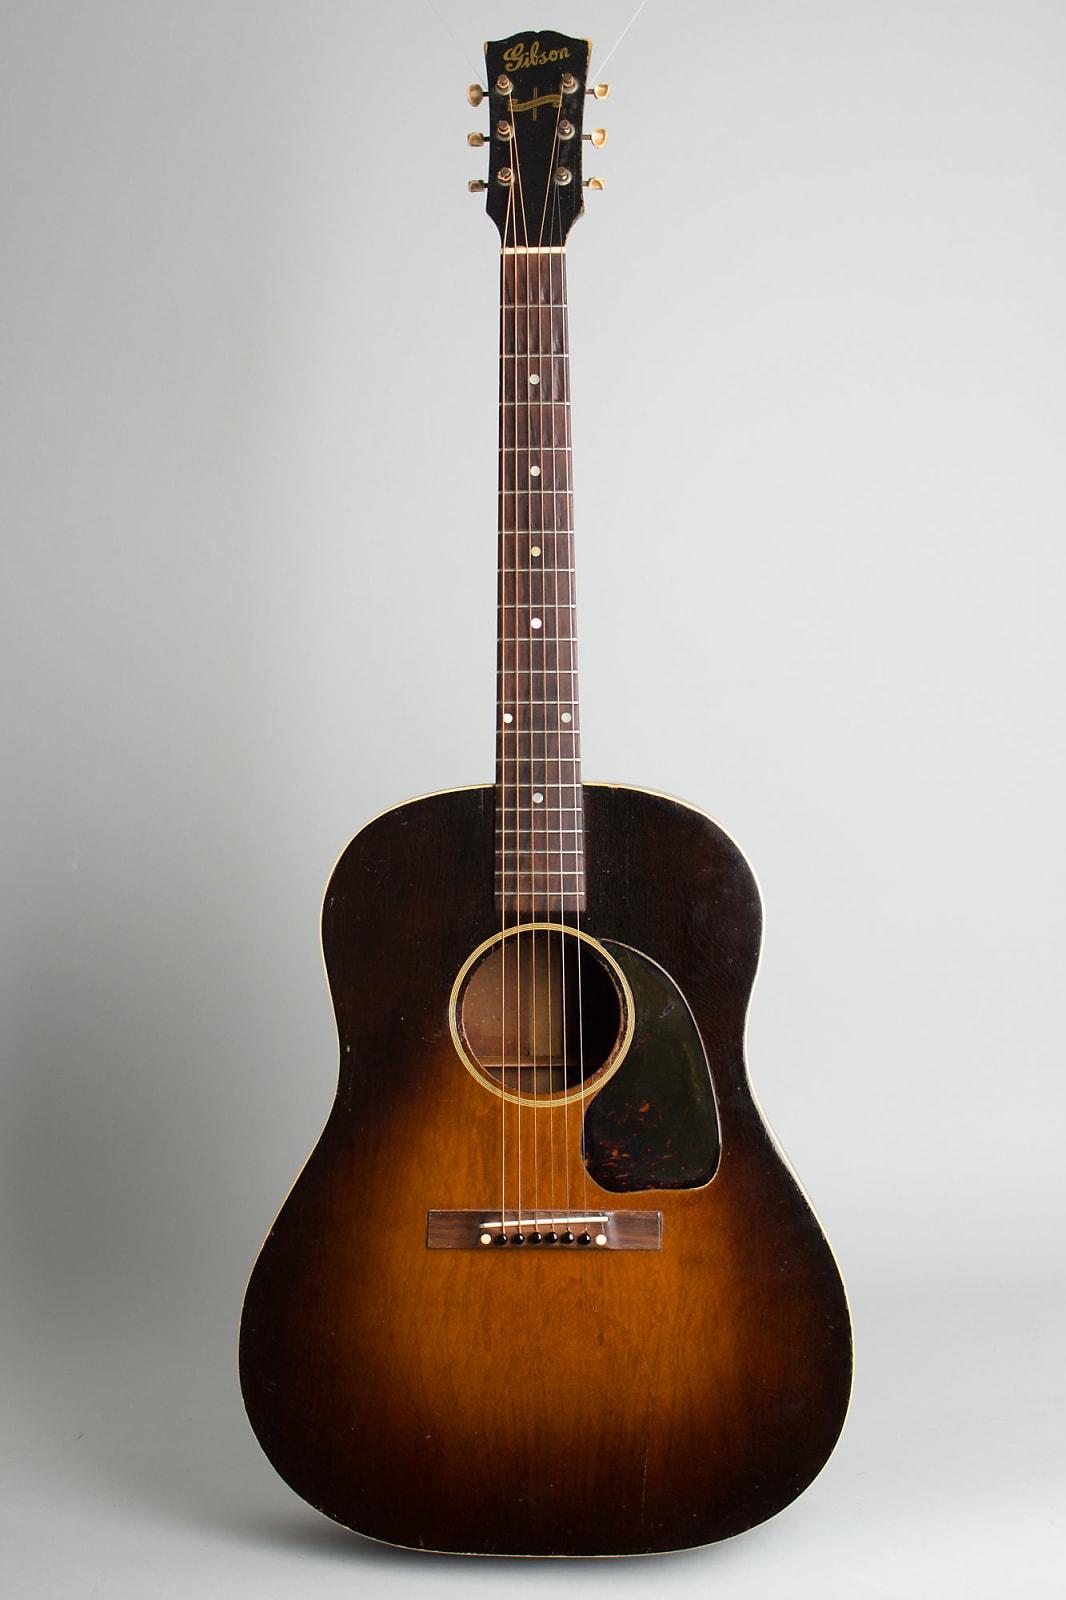 Gibson  J-45 Flat Top Acoustic Guitar,  c. 1943, ser. #2329-4, black tolex hard shell case.